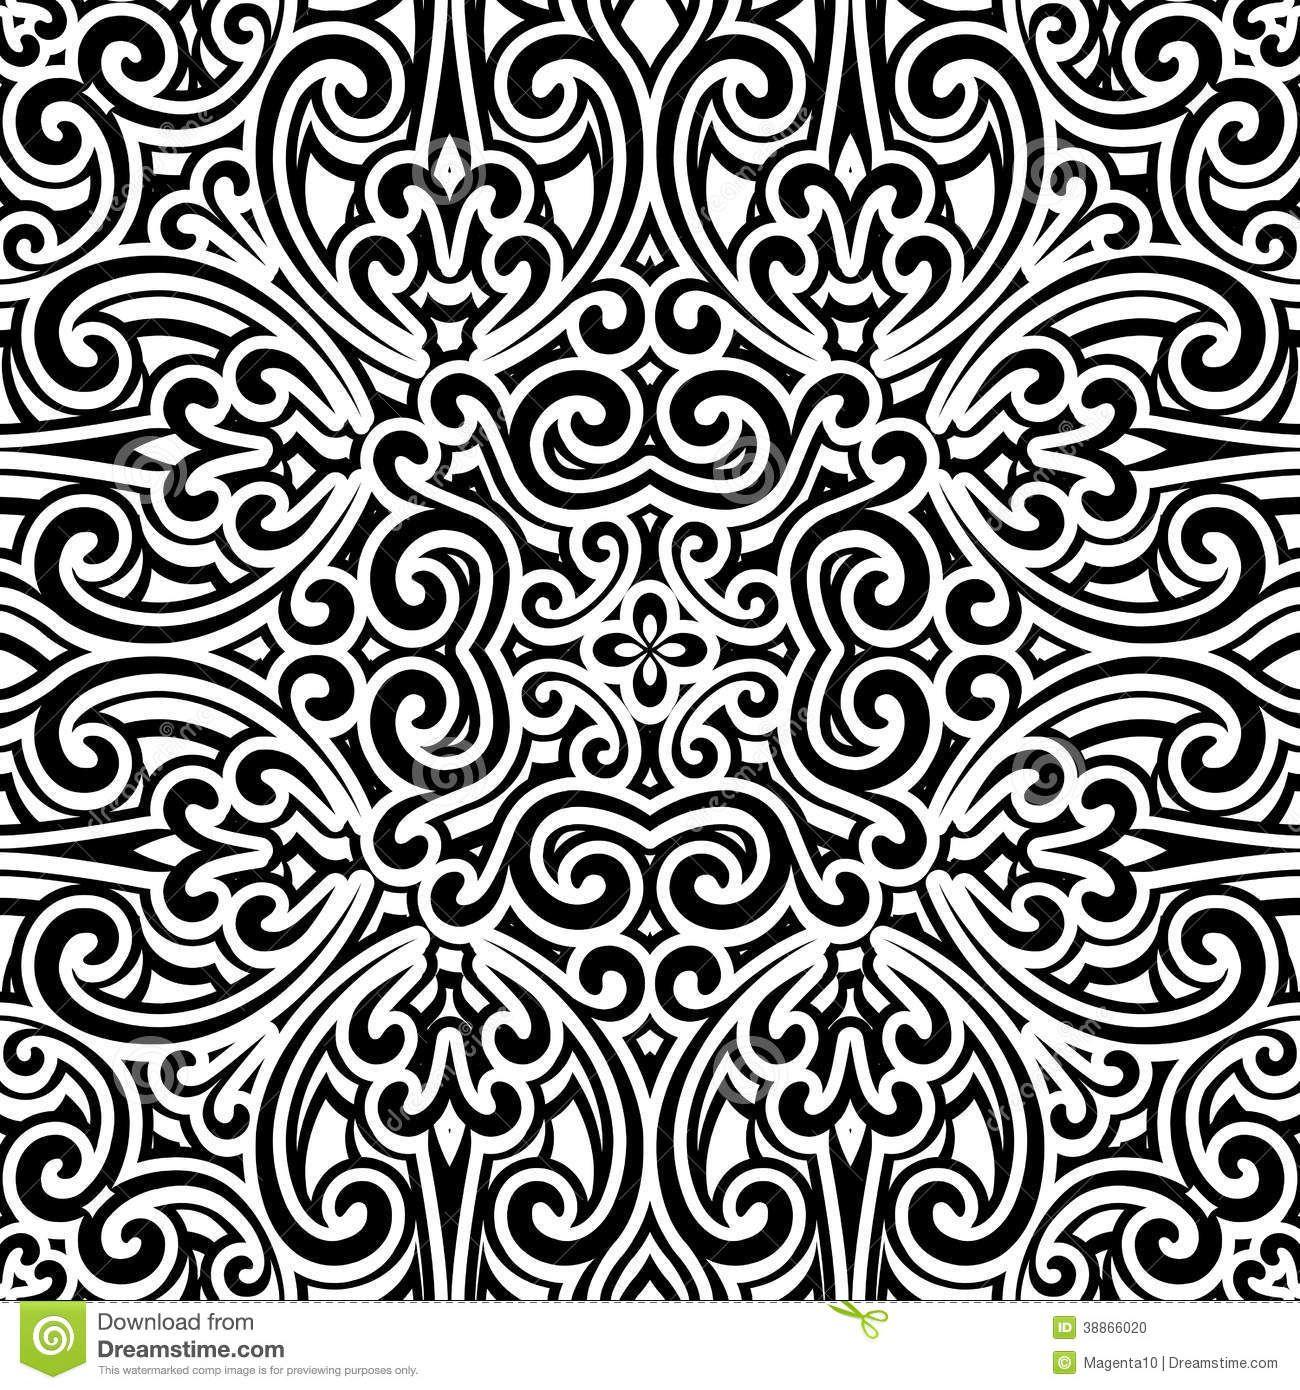 Illustration About Black And White Background Vintage Ornament Seamless Pattern Illustr White Pattern Background Vintage Ornaments Gold And Black Background